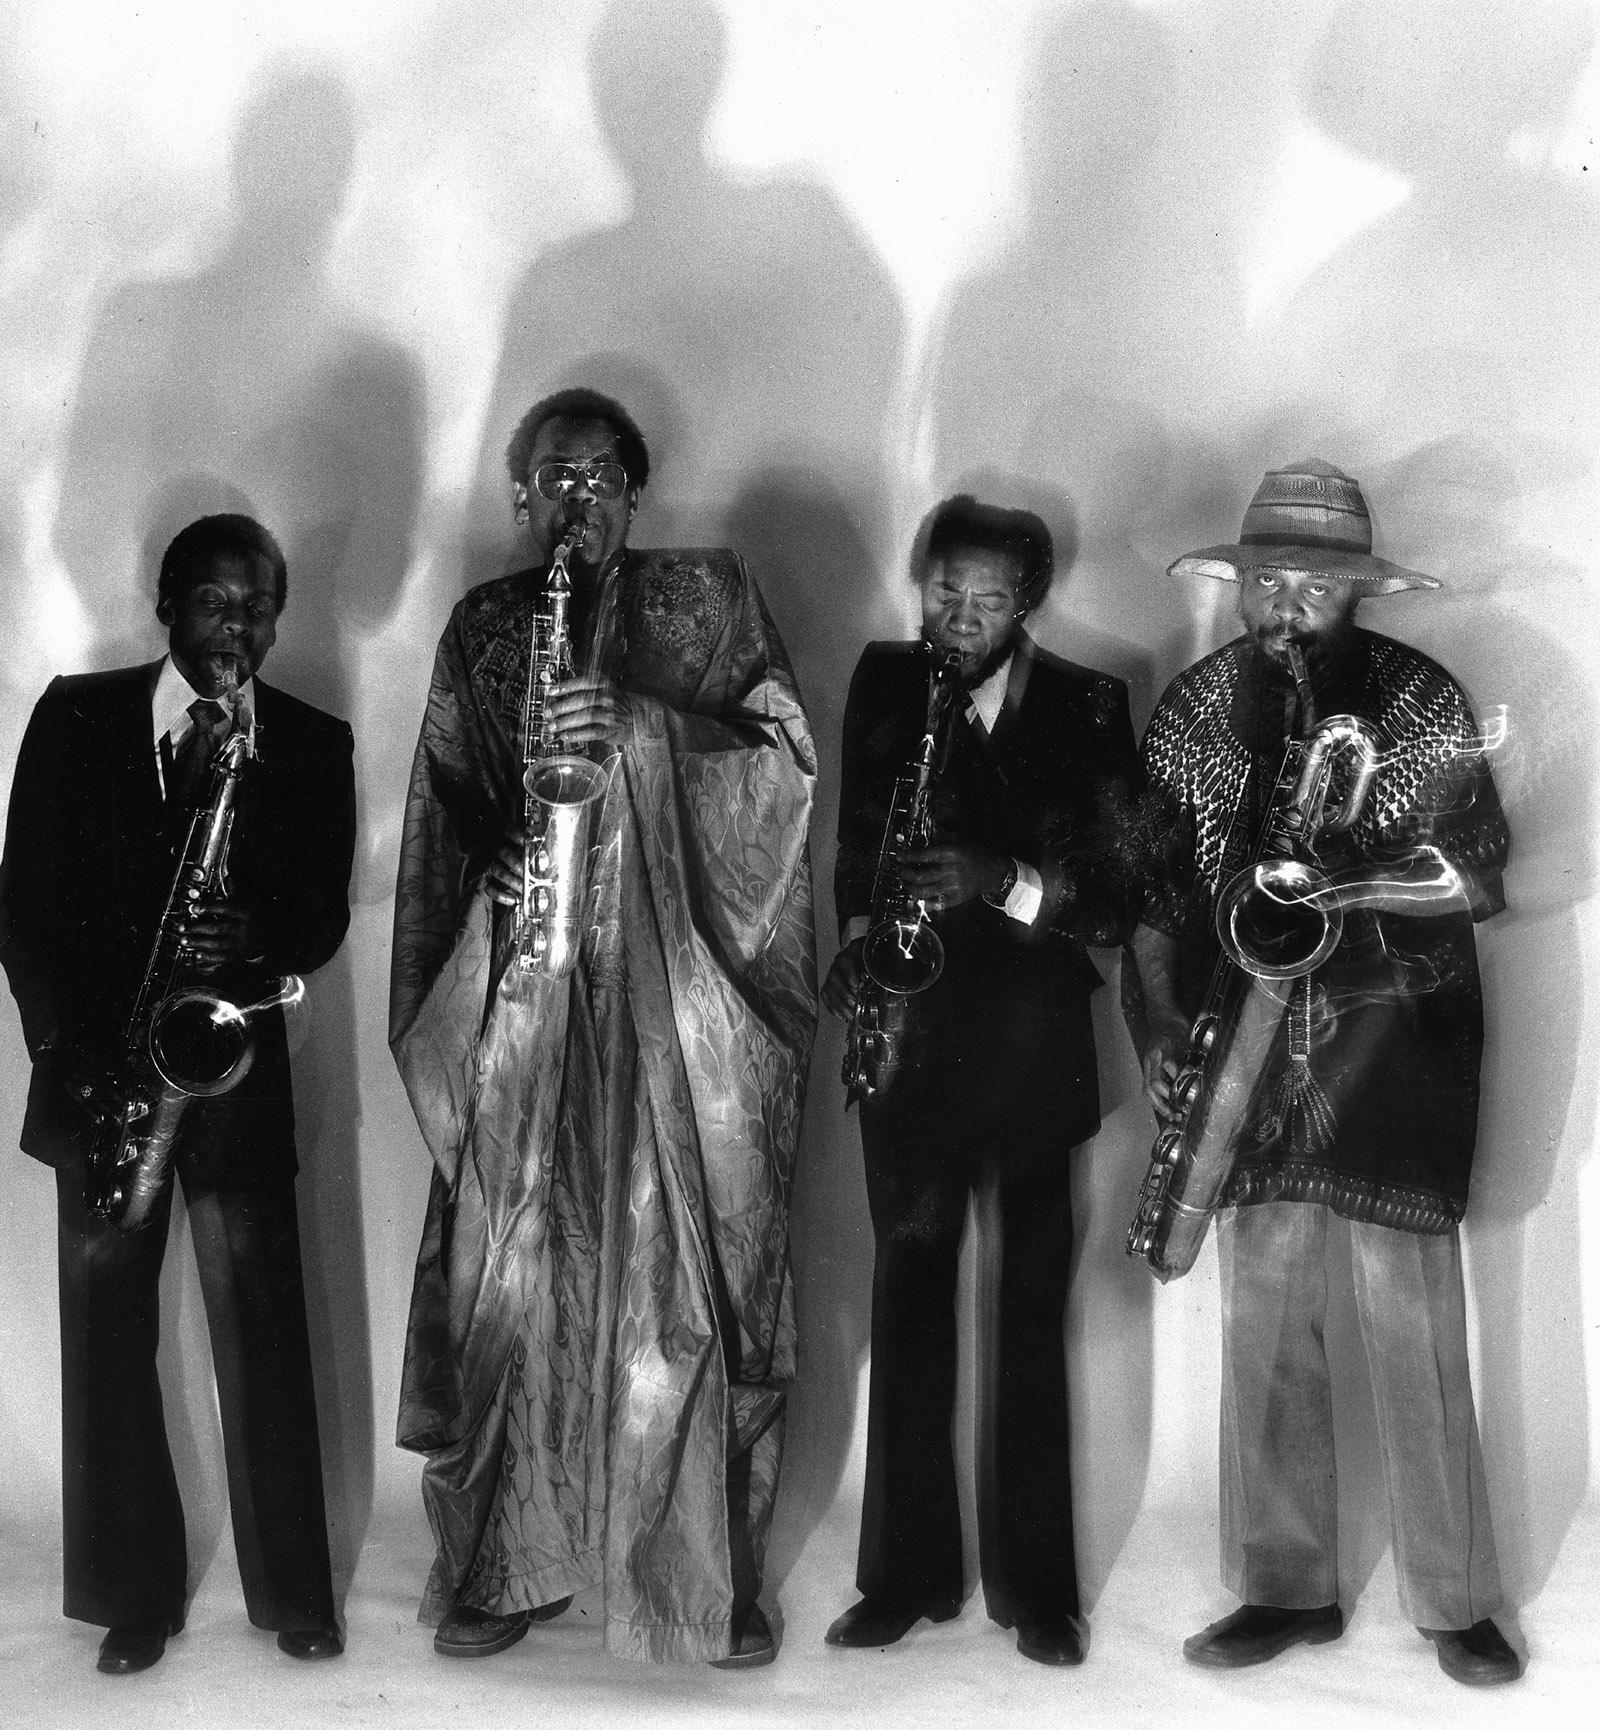 World Saxophone Quartet members David Murray, Julius Hemphill, Oliver Lake, and Hamiet Bluiett